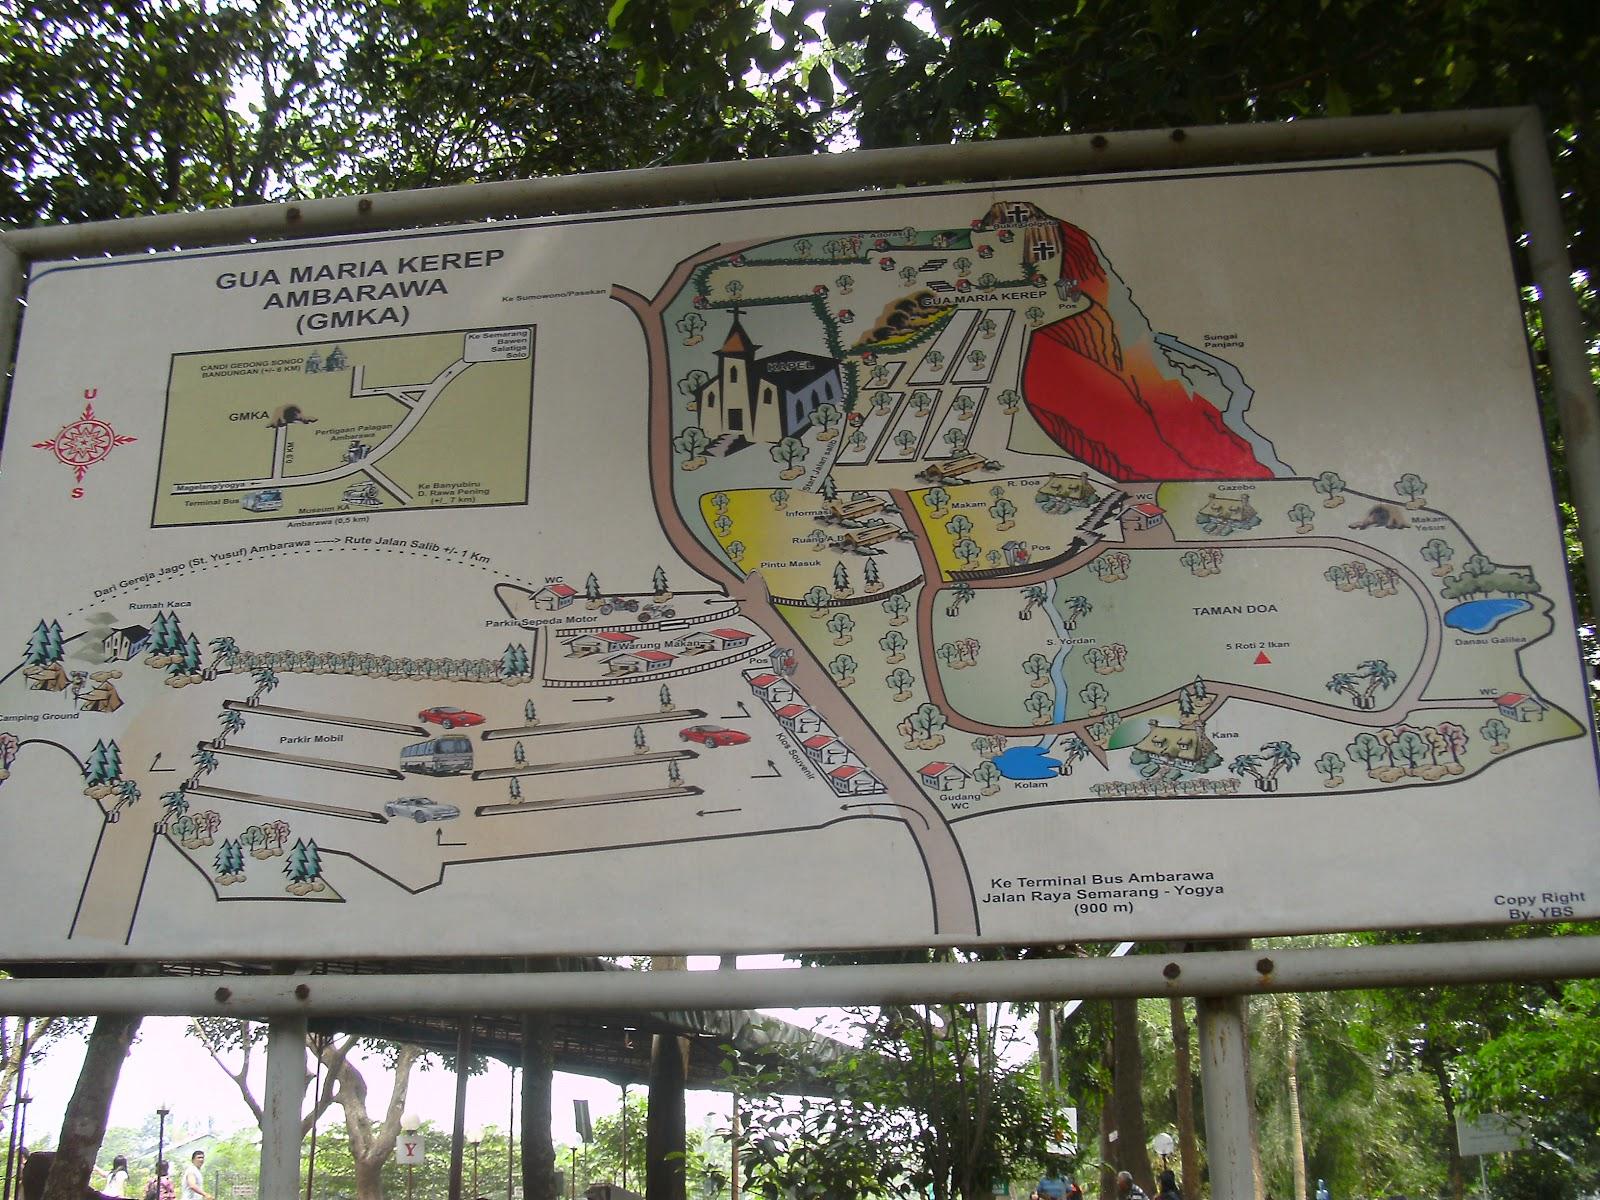 Travelling Pengalaman Seru Nggak Terlupakan Sempat Mampir Jg Goa Maria